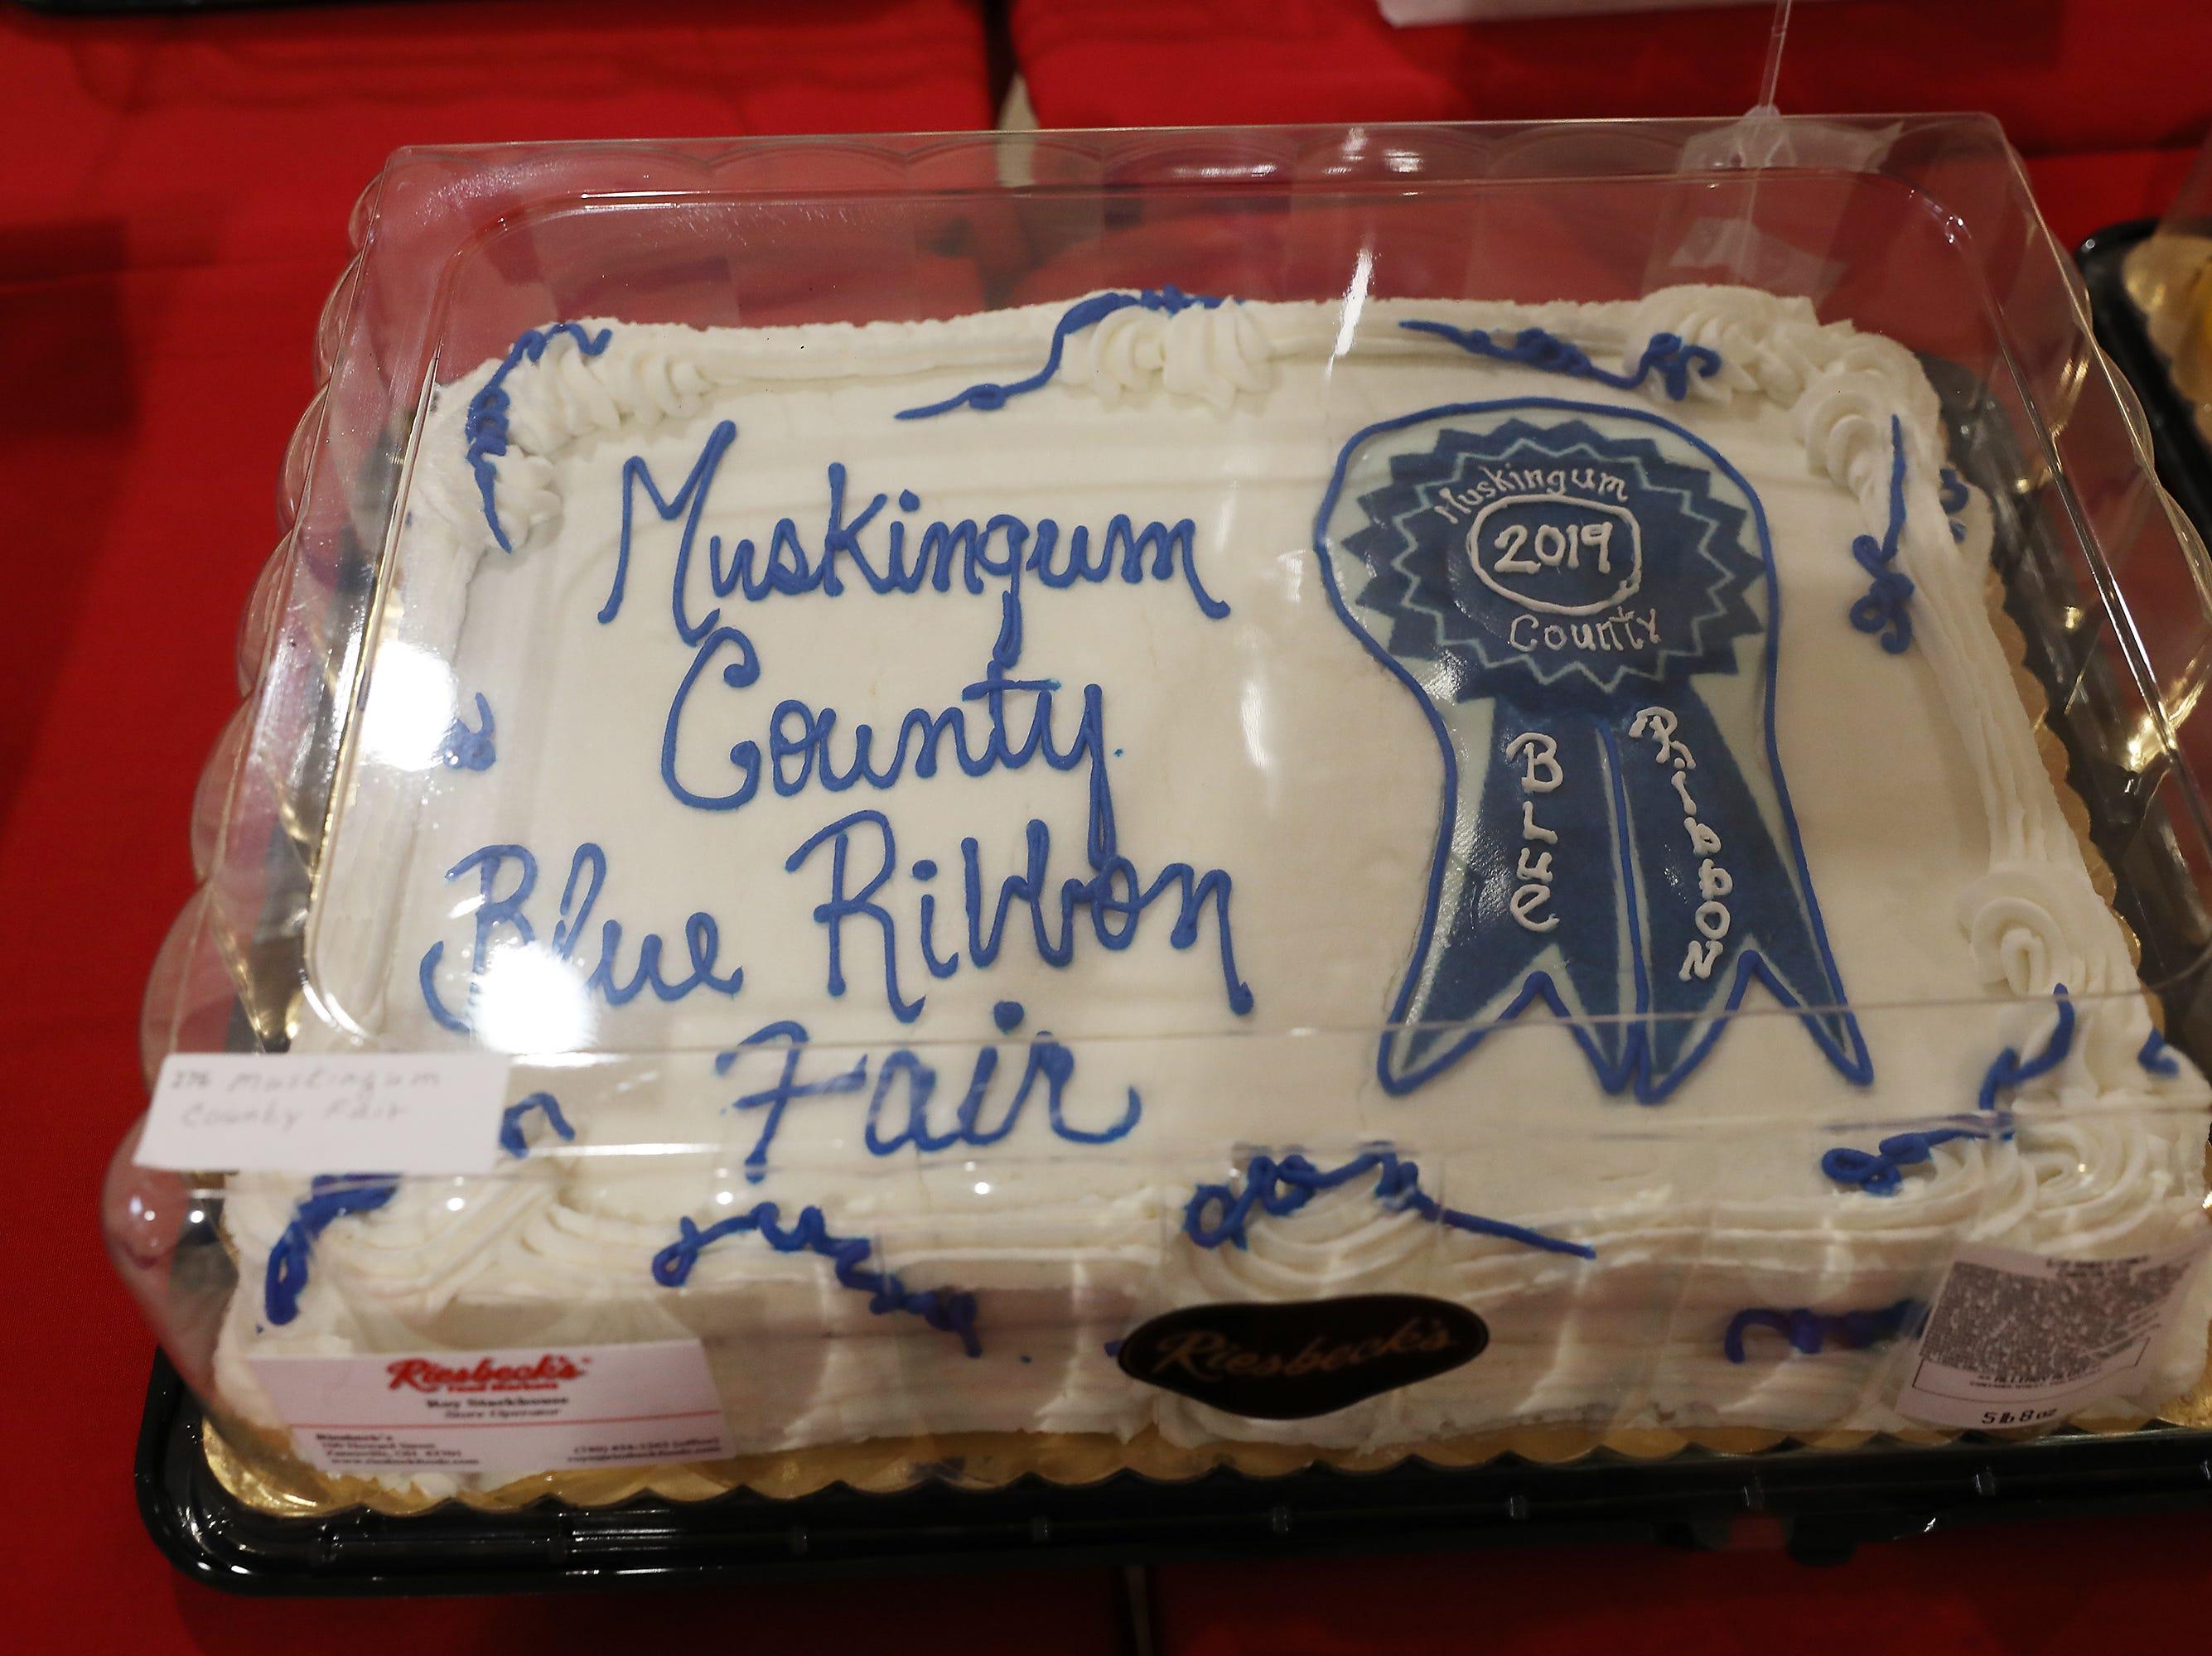 11 A.M. Friday cake 276 Muskingum County Fair.